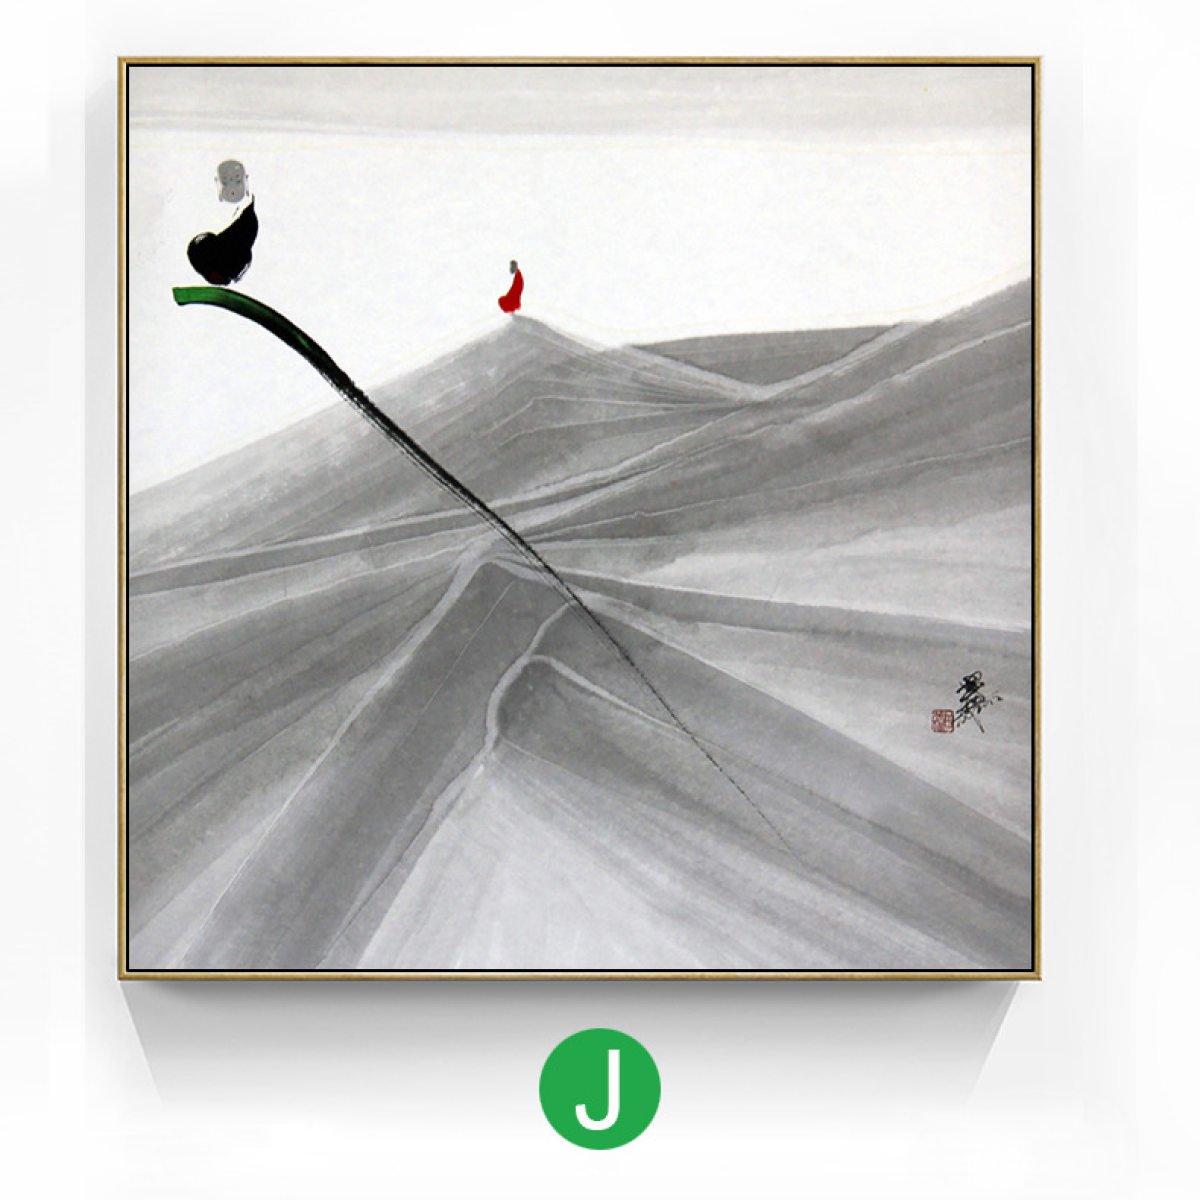 Nwn フォトフレーム コラージュ 装飾絵画 インクスタイル 野生のレストラン レストラン ホテル ホテルの抽象画 装飾絵画 27.6*27.6in 5698845 27.6*27.6in J B07JY5VZD8